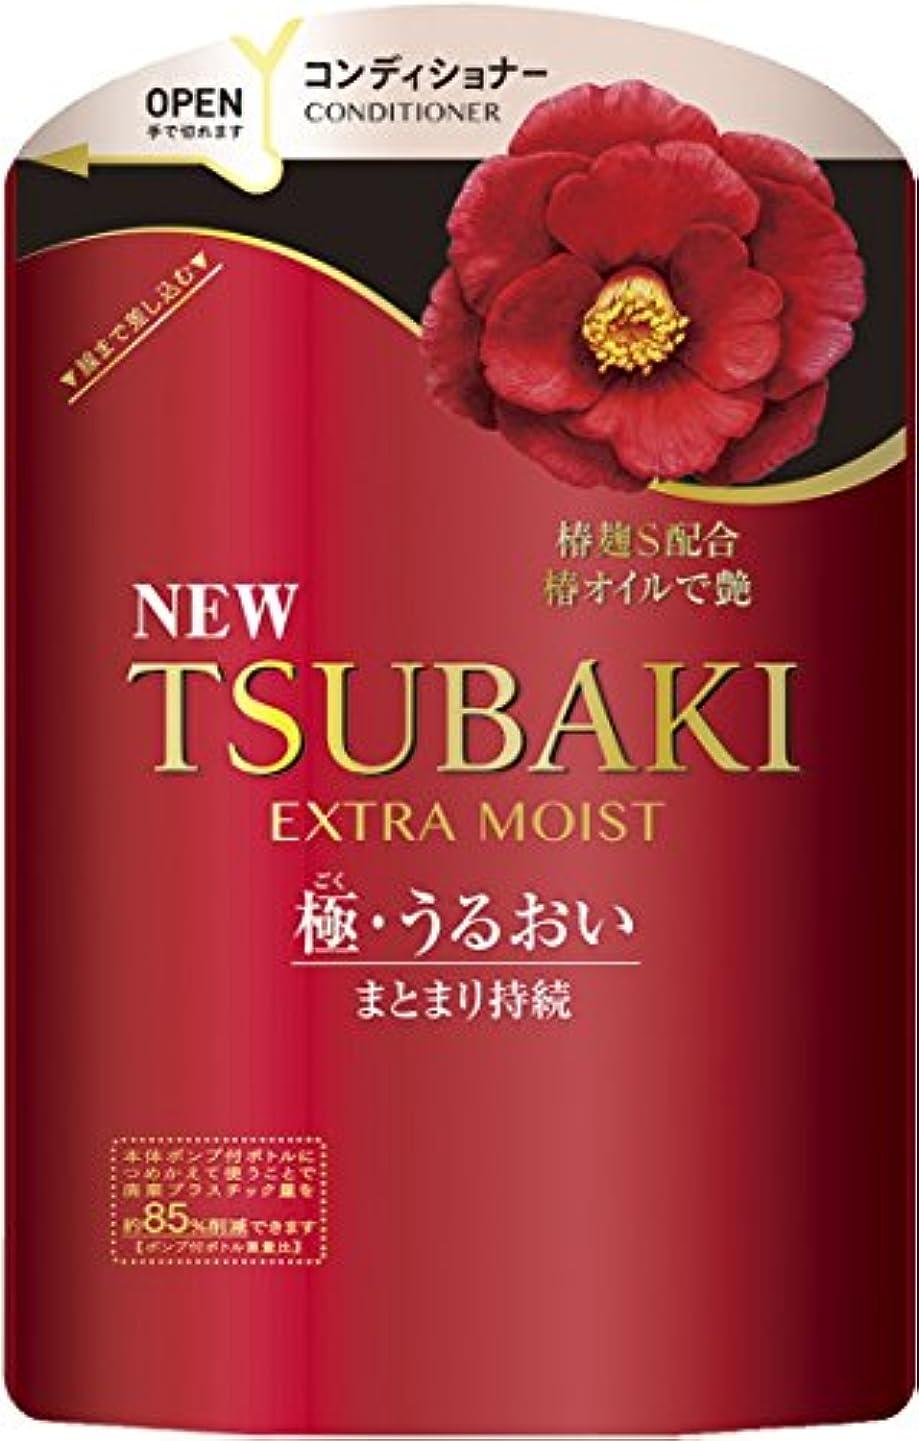 TSUBAKI エクストラモイスト コンディショナー つめかえ用 345ml